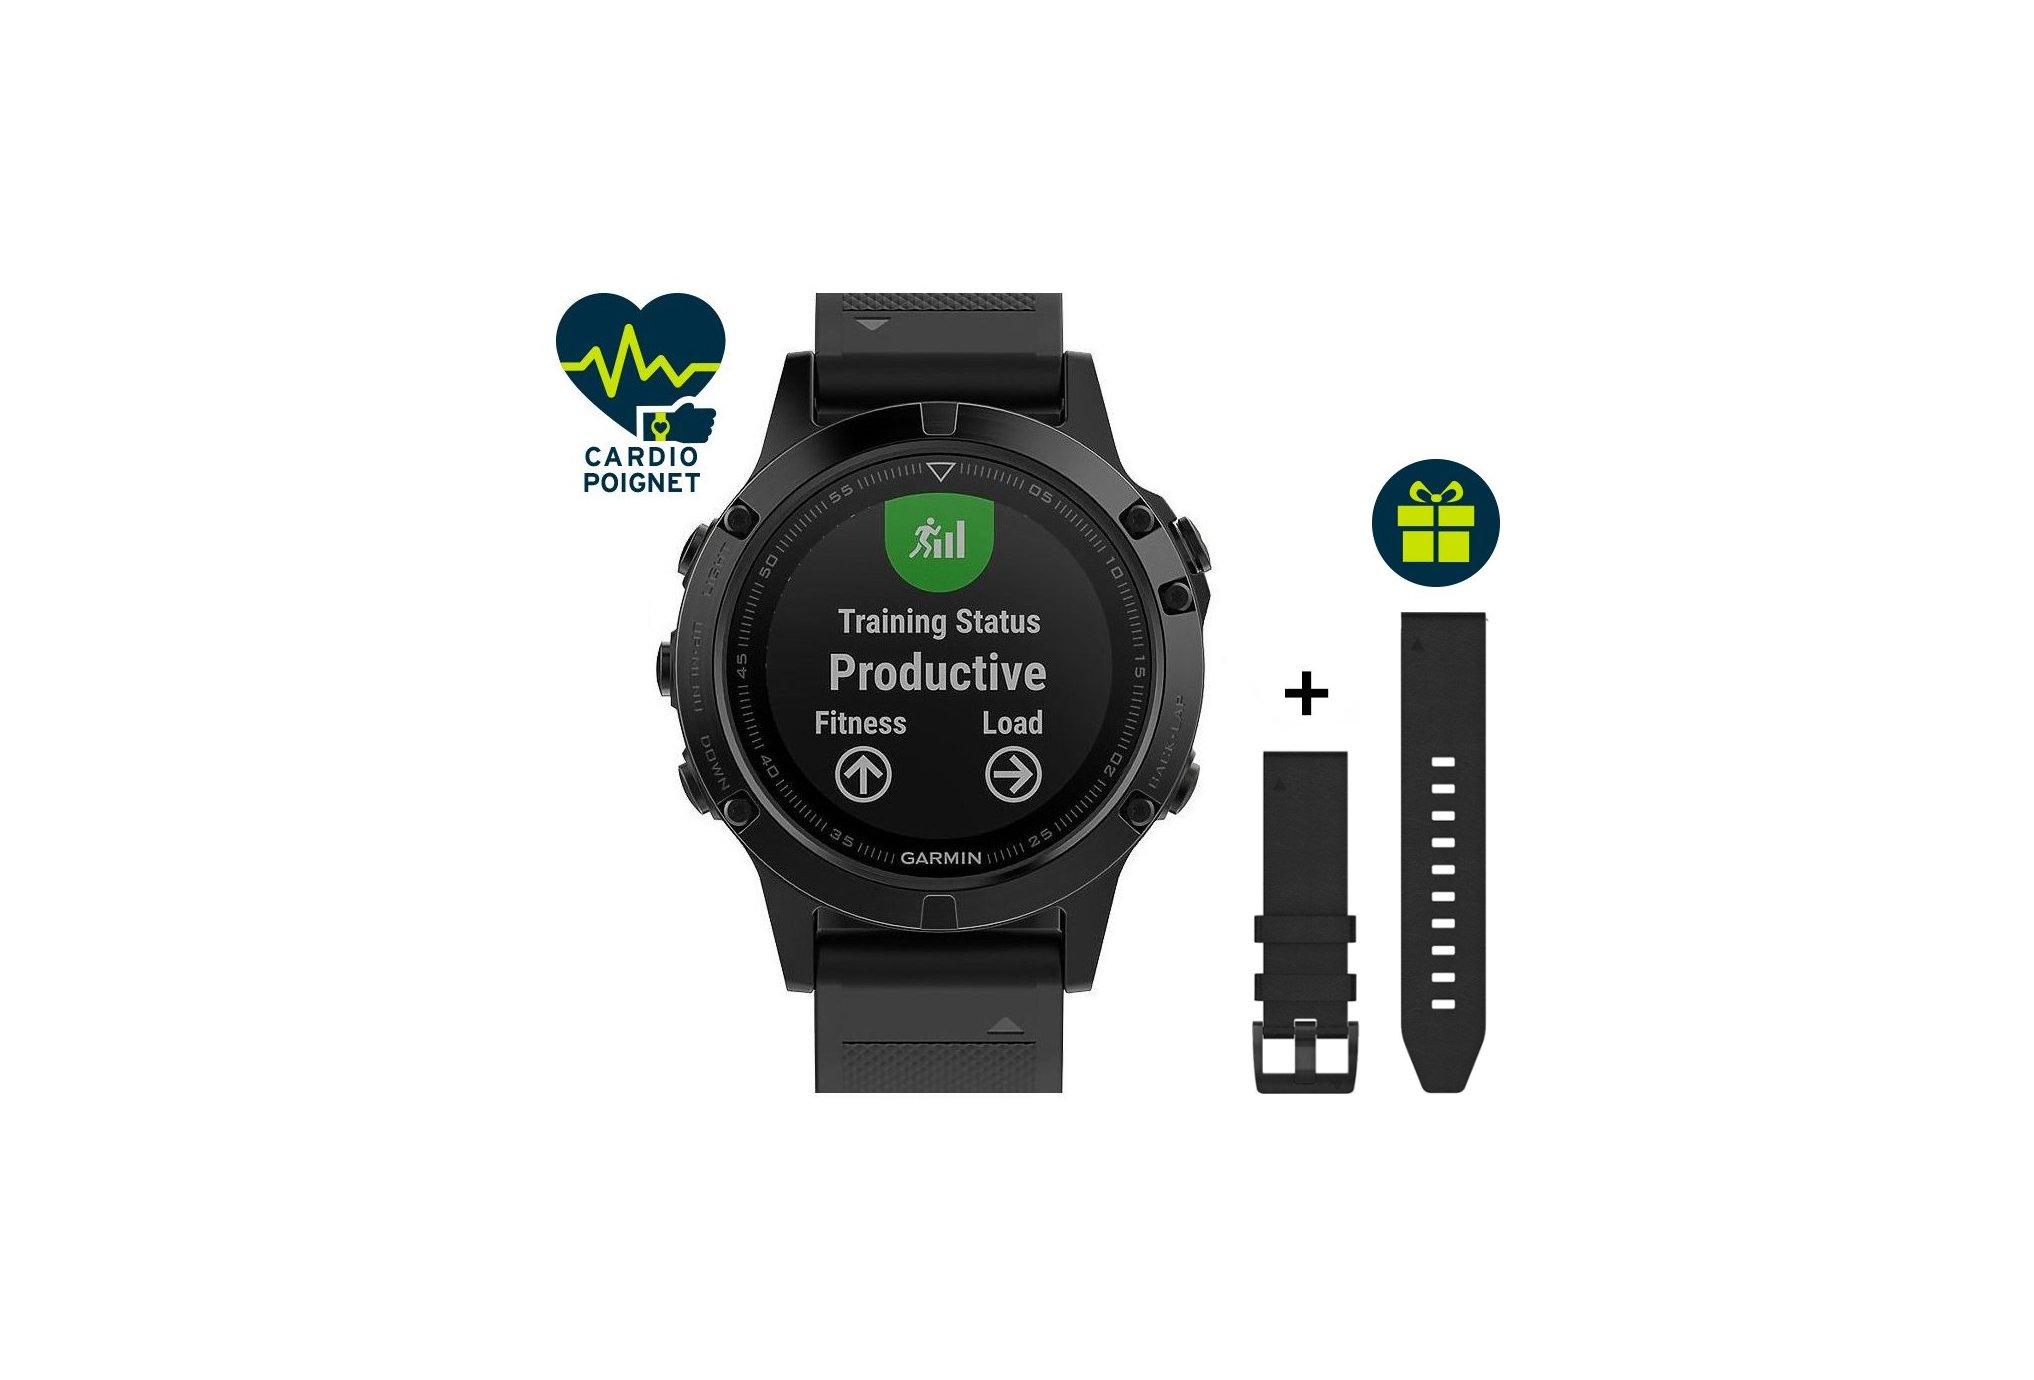 b7af0c662299 Garmin Fenix 5S  Características - Reloj deportivo